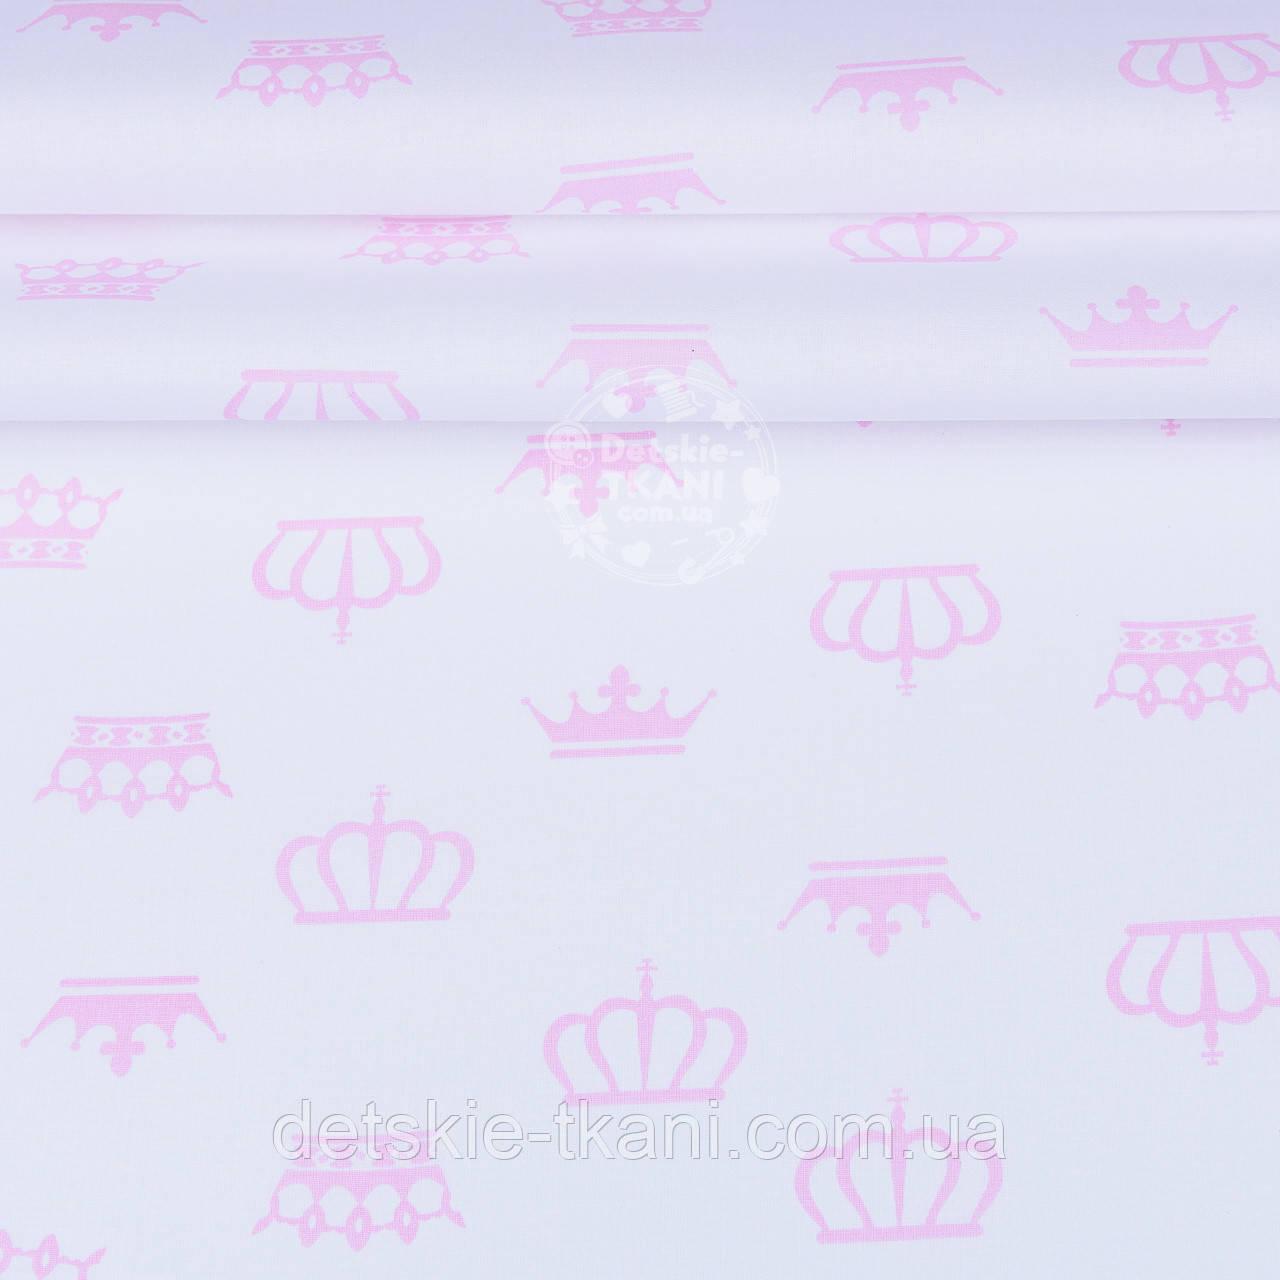 Отрез ранфорса с розовыми коронами на белом фоне (№1218), 65*220